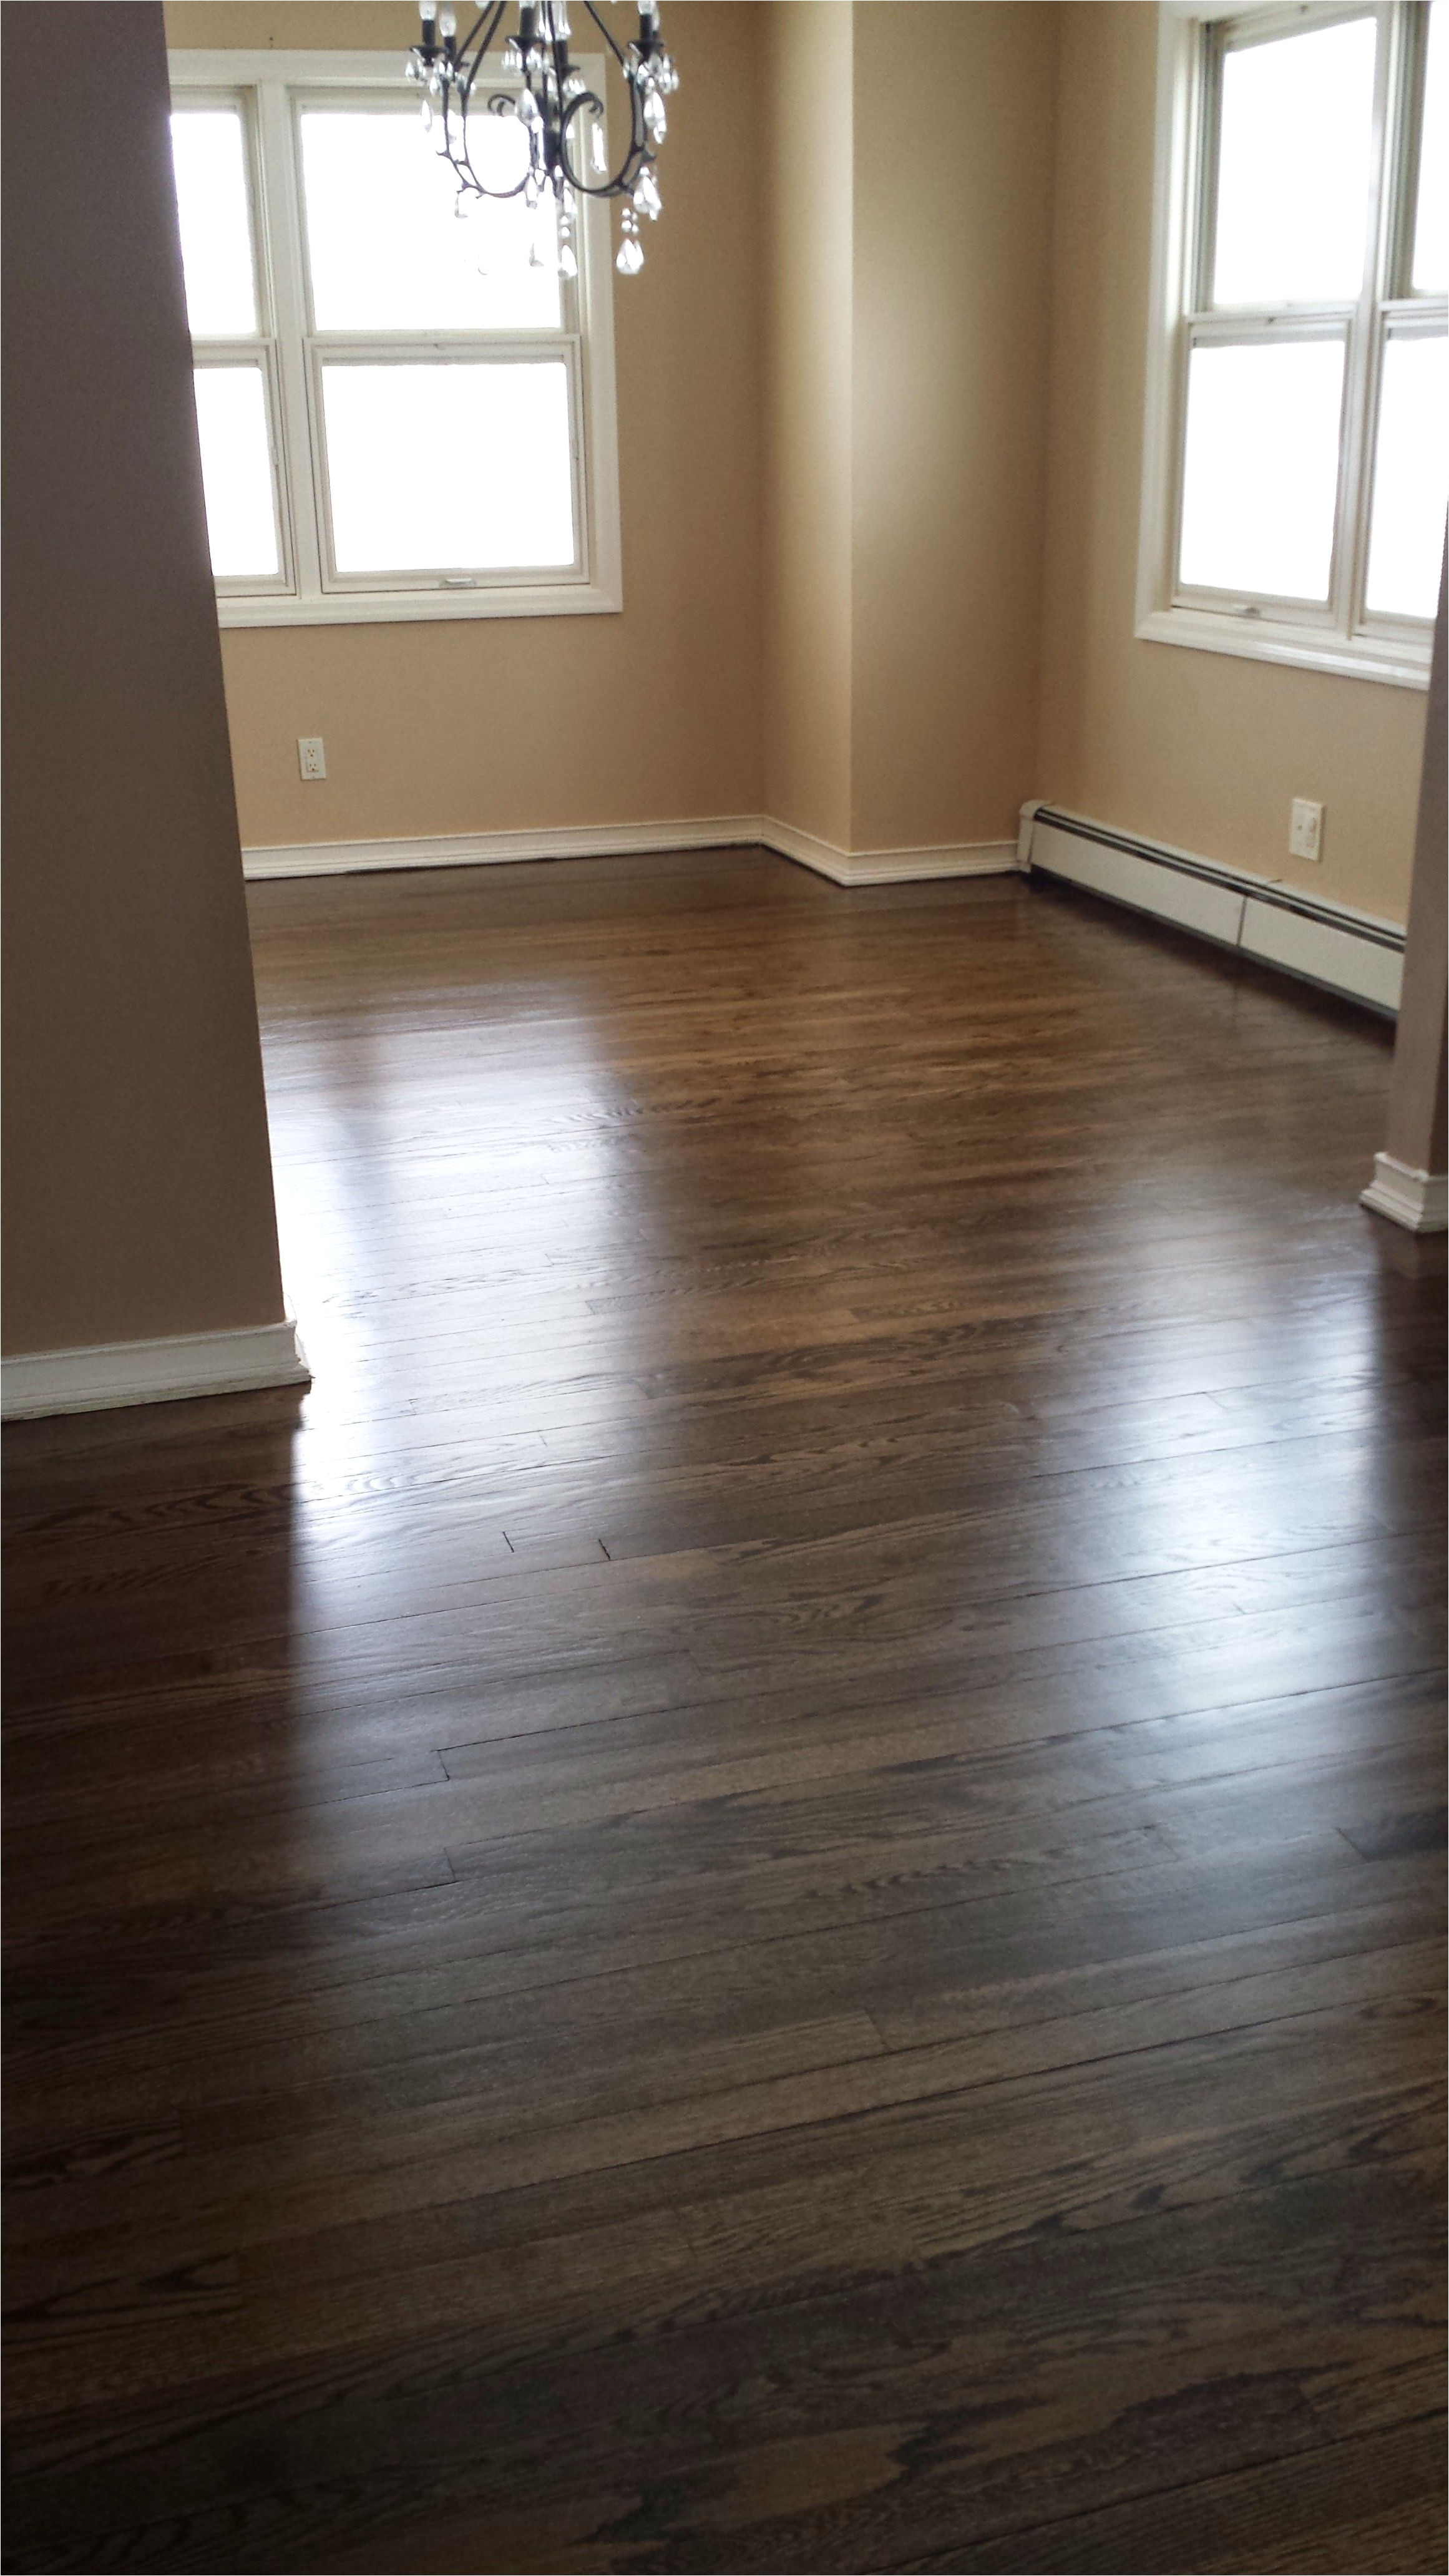 how to finish hardwood floors of refinish hardwood floors diy dahuacctvth com regarding refinish hardwood floors diy